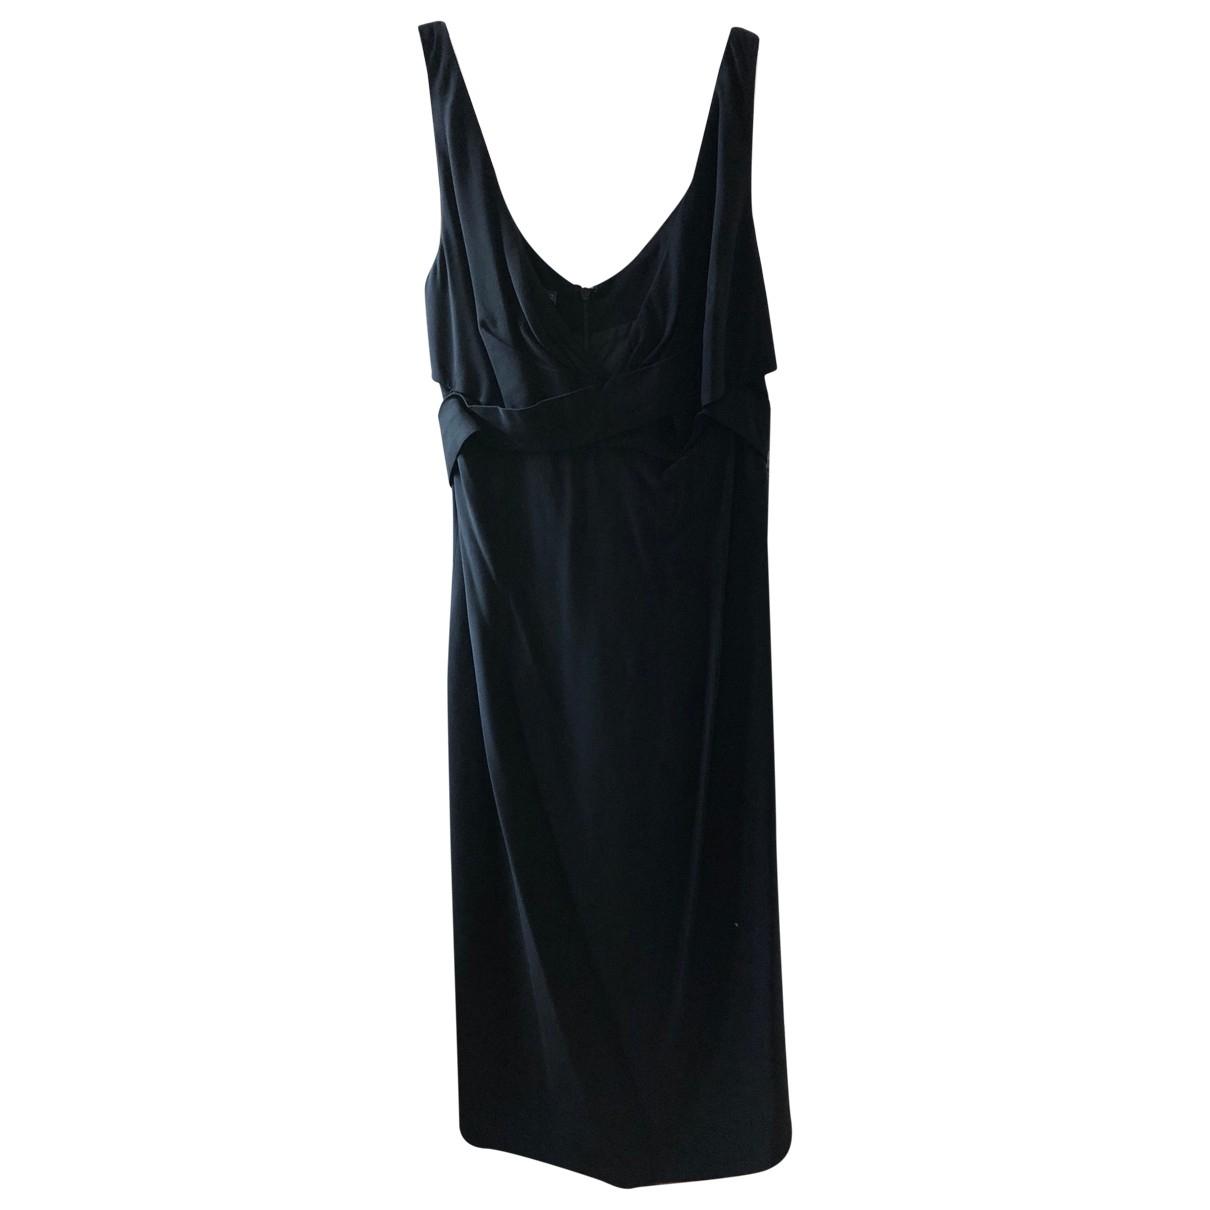 Alexander Mcqueen \N Kleid in  Schwarz Viskose